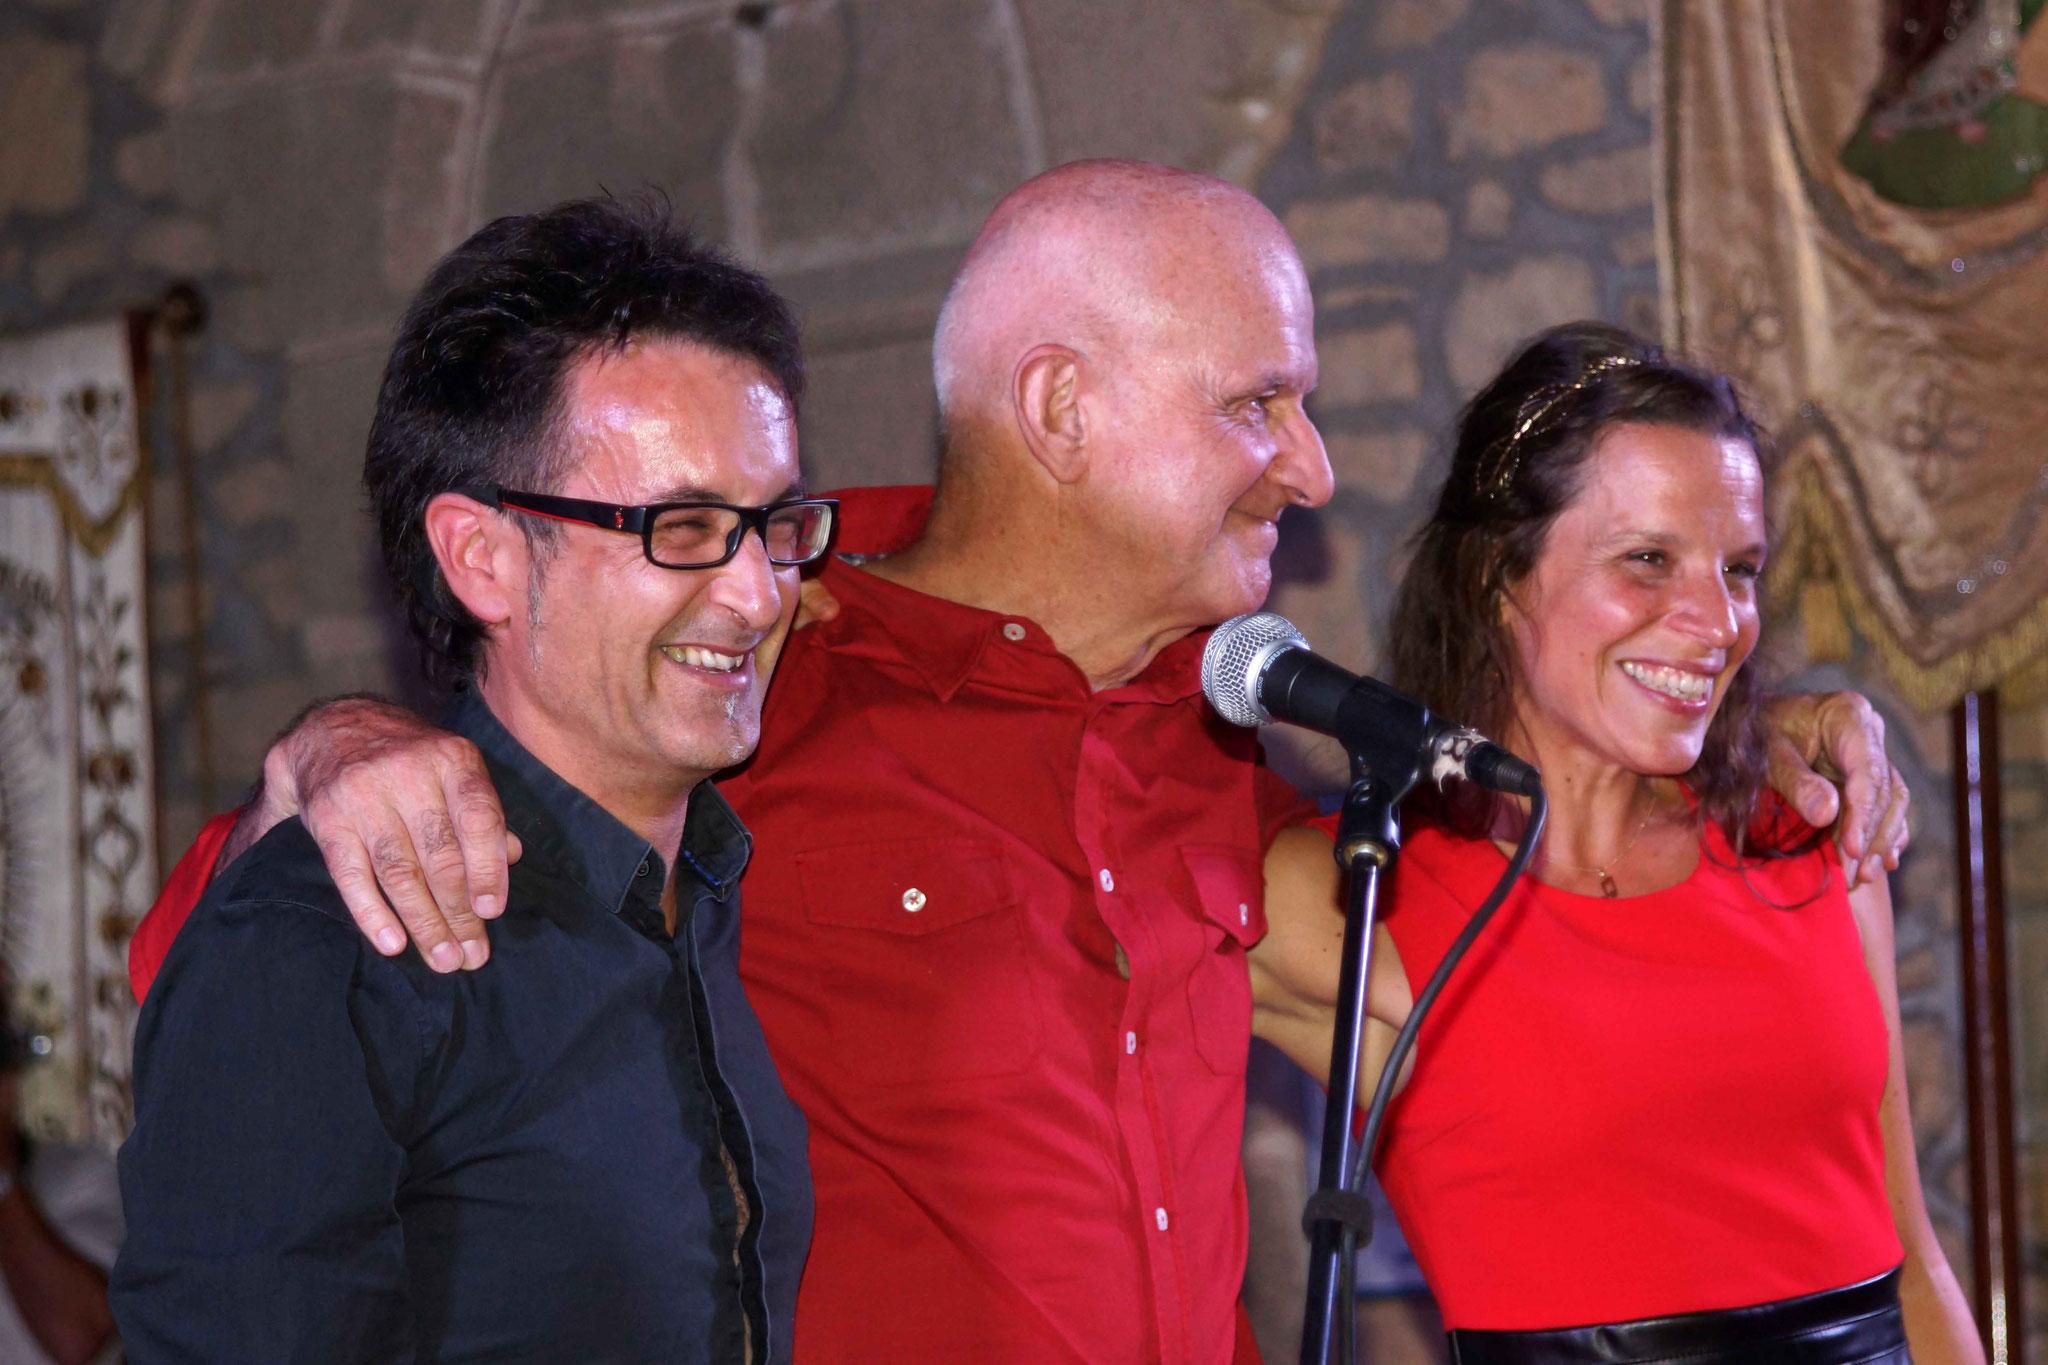 Concert de Kermaria Sulard, 28 août 2016 ; 11